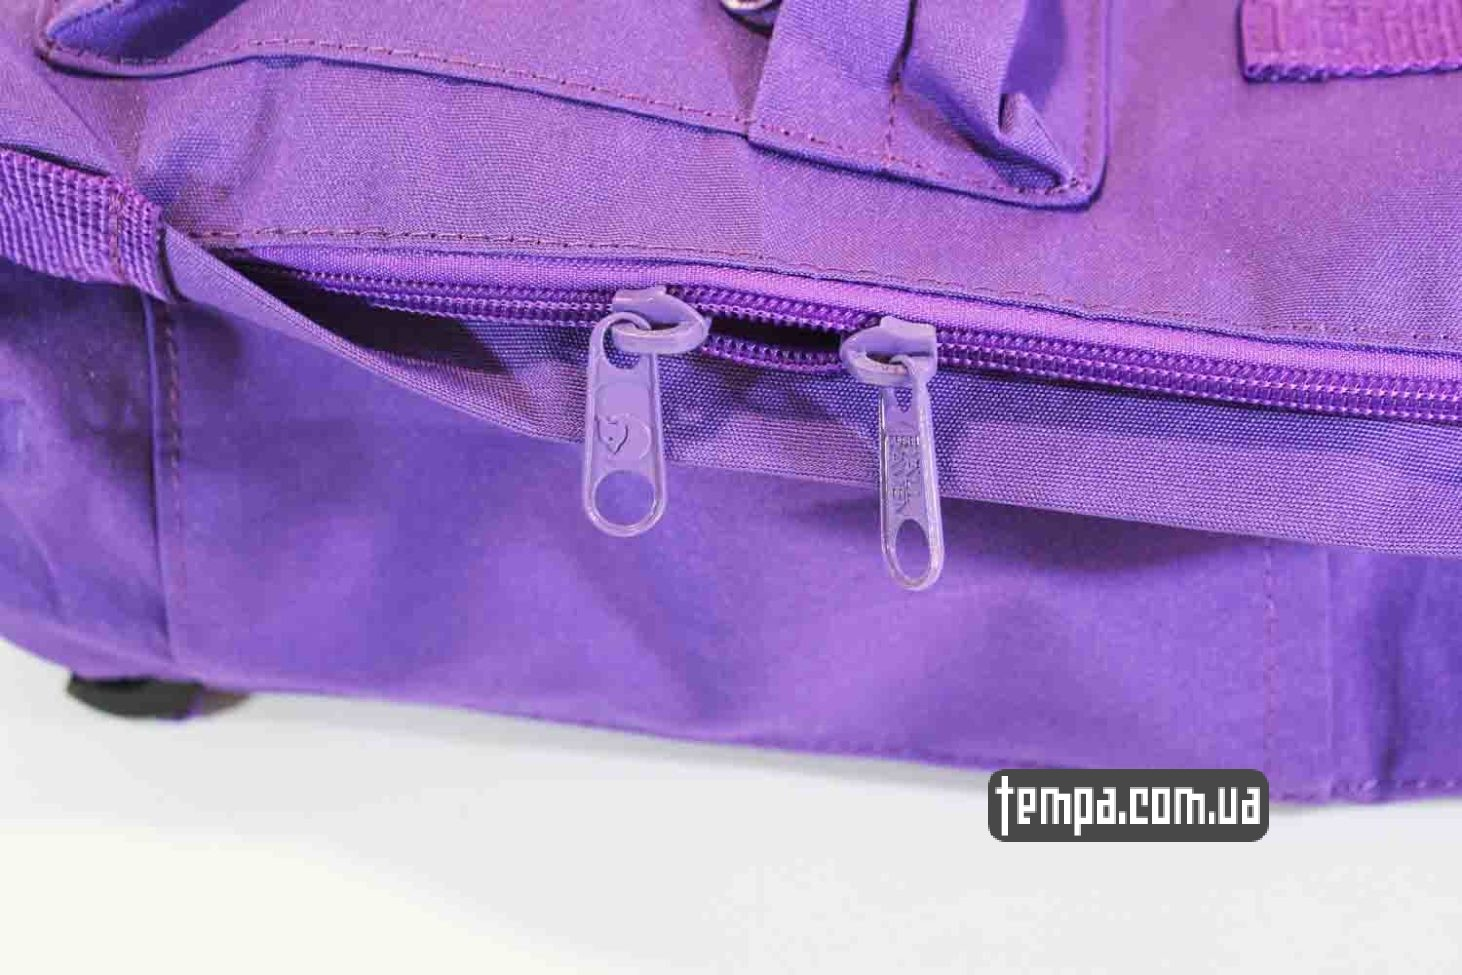 original норвегия шведция рюкзак re kanken fjallraven purple сиреневый фиолетовый